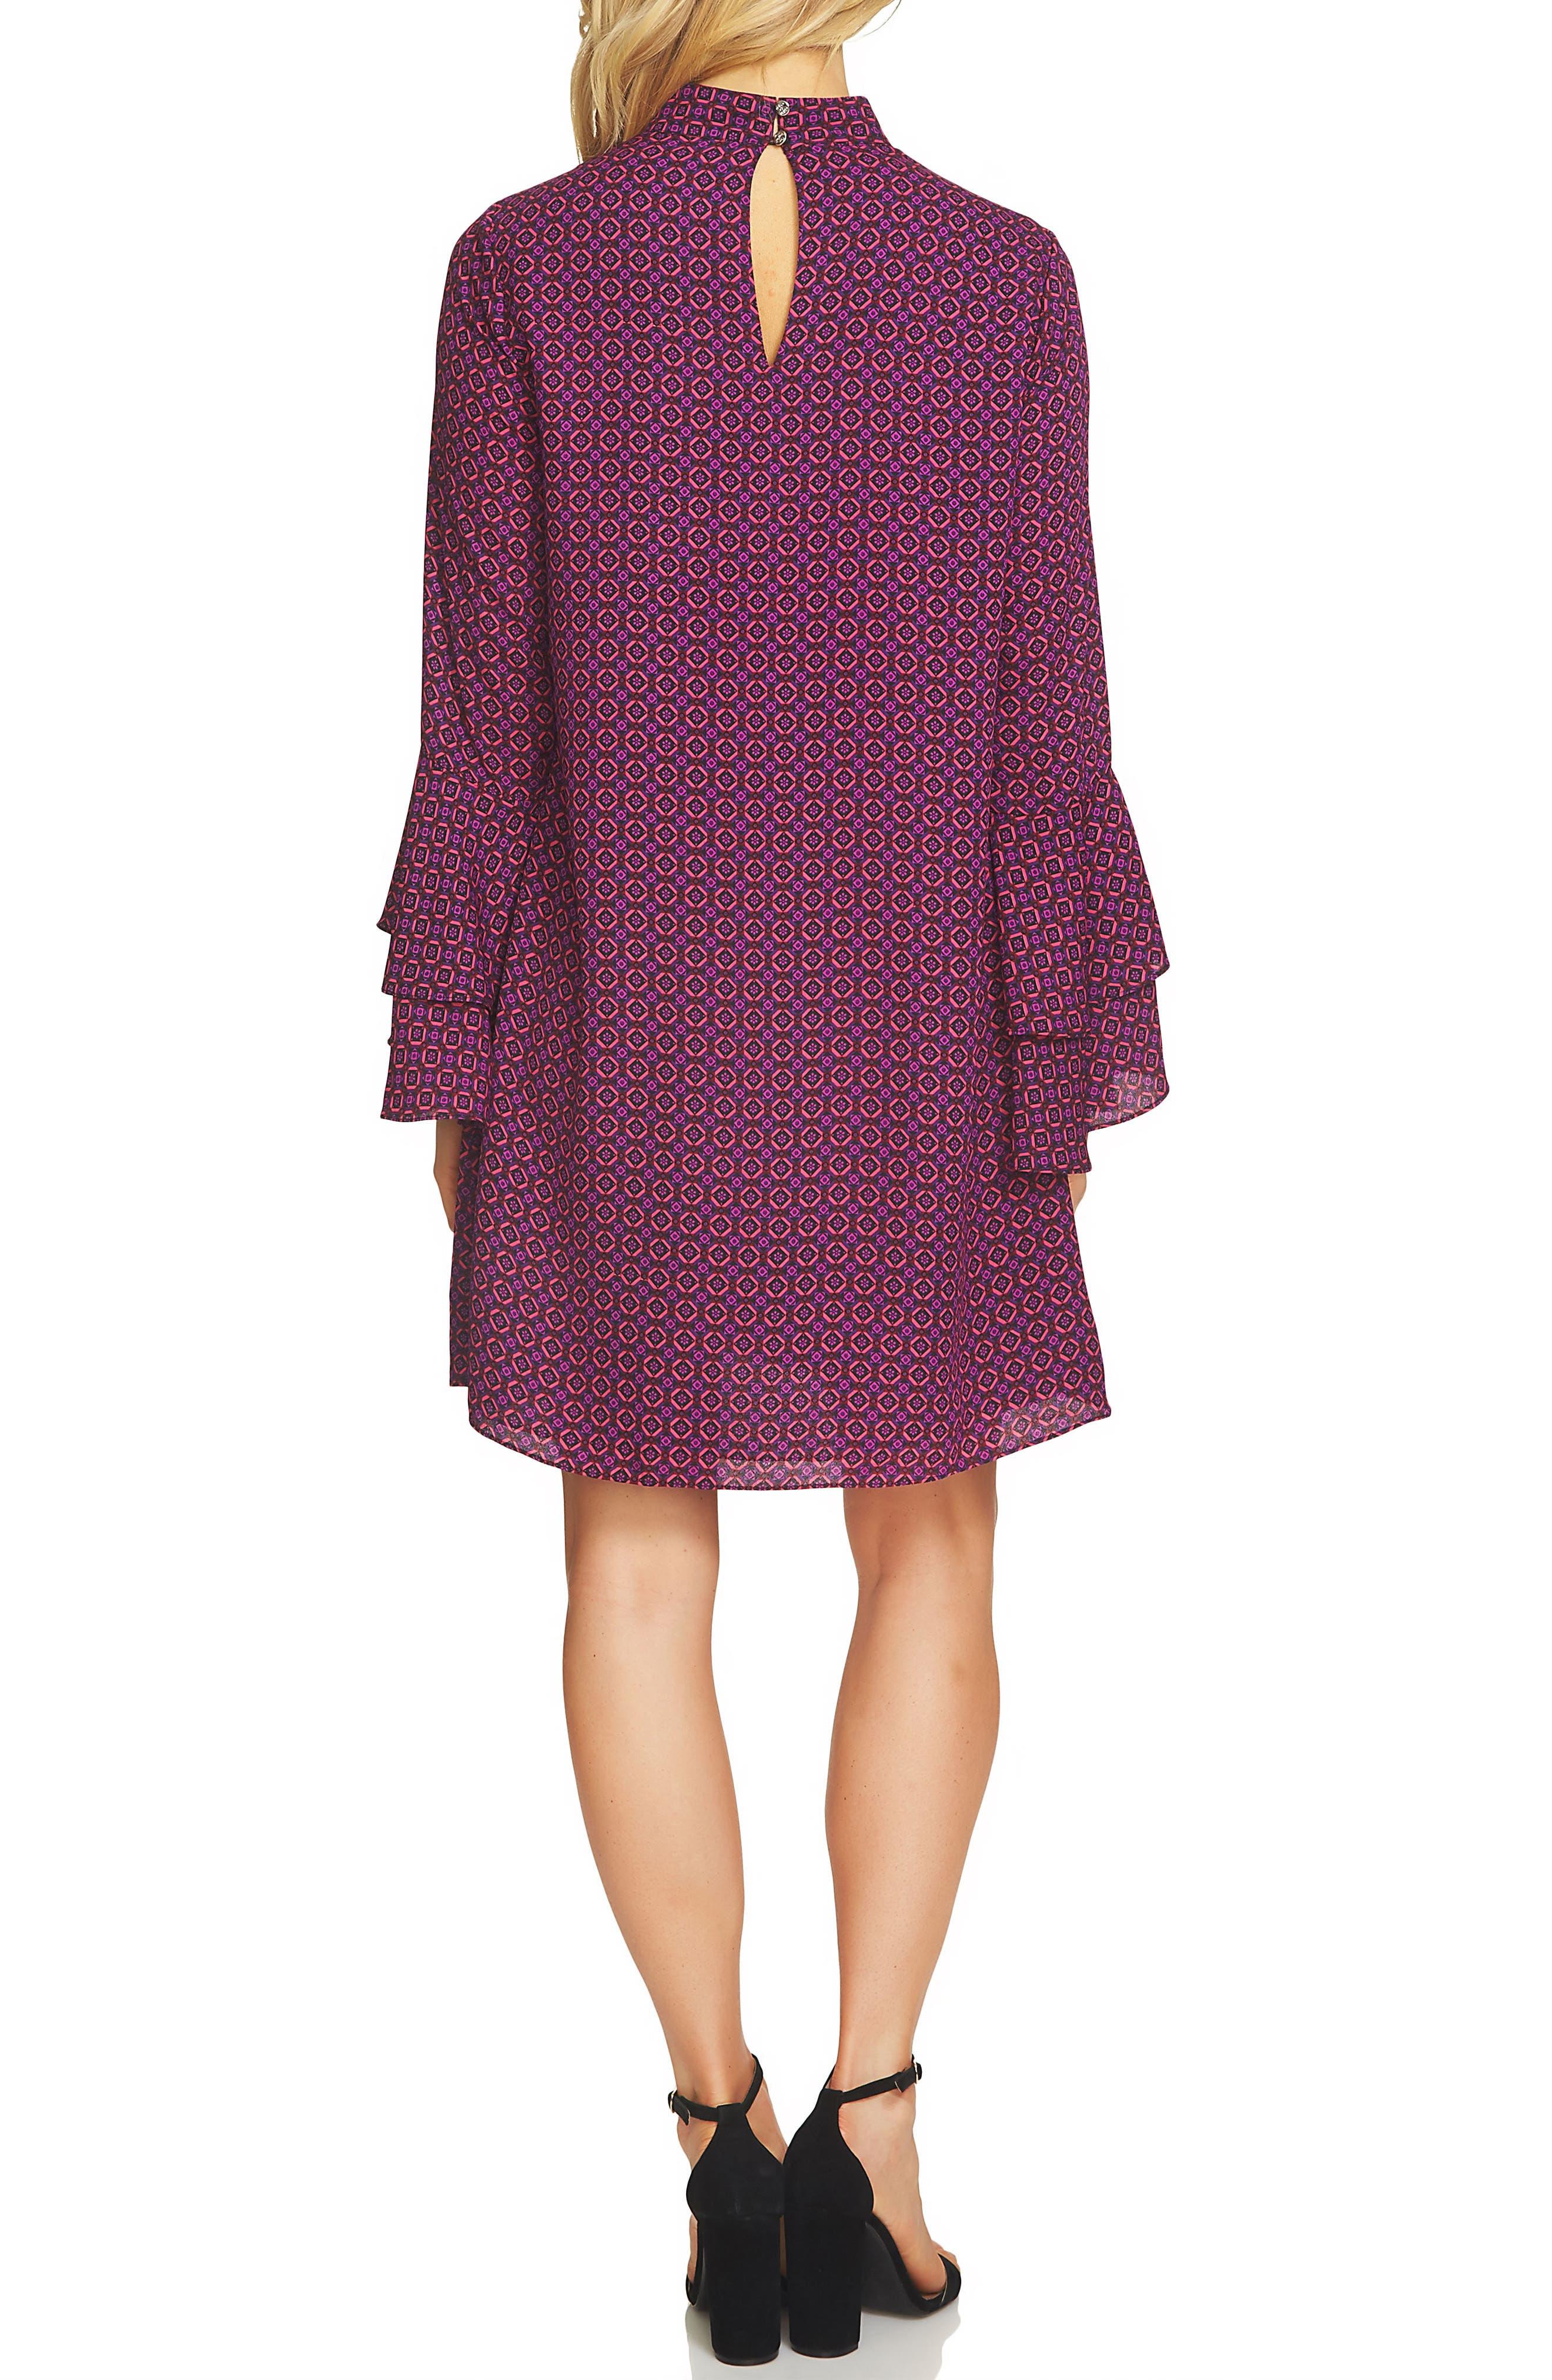 Choker Bell Sleeve Dress,                             Alternate thumbnail 2, color,                             Vibrant Cerise